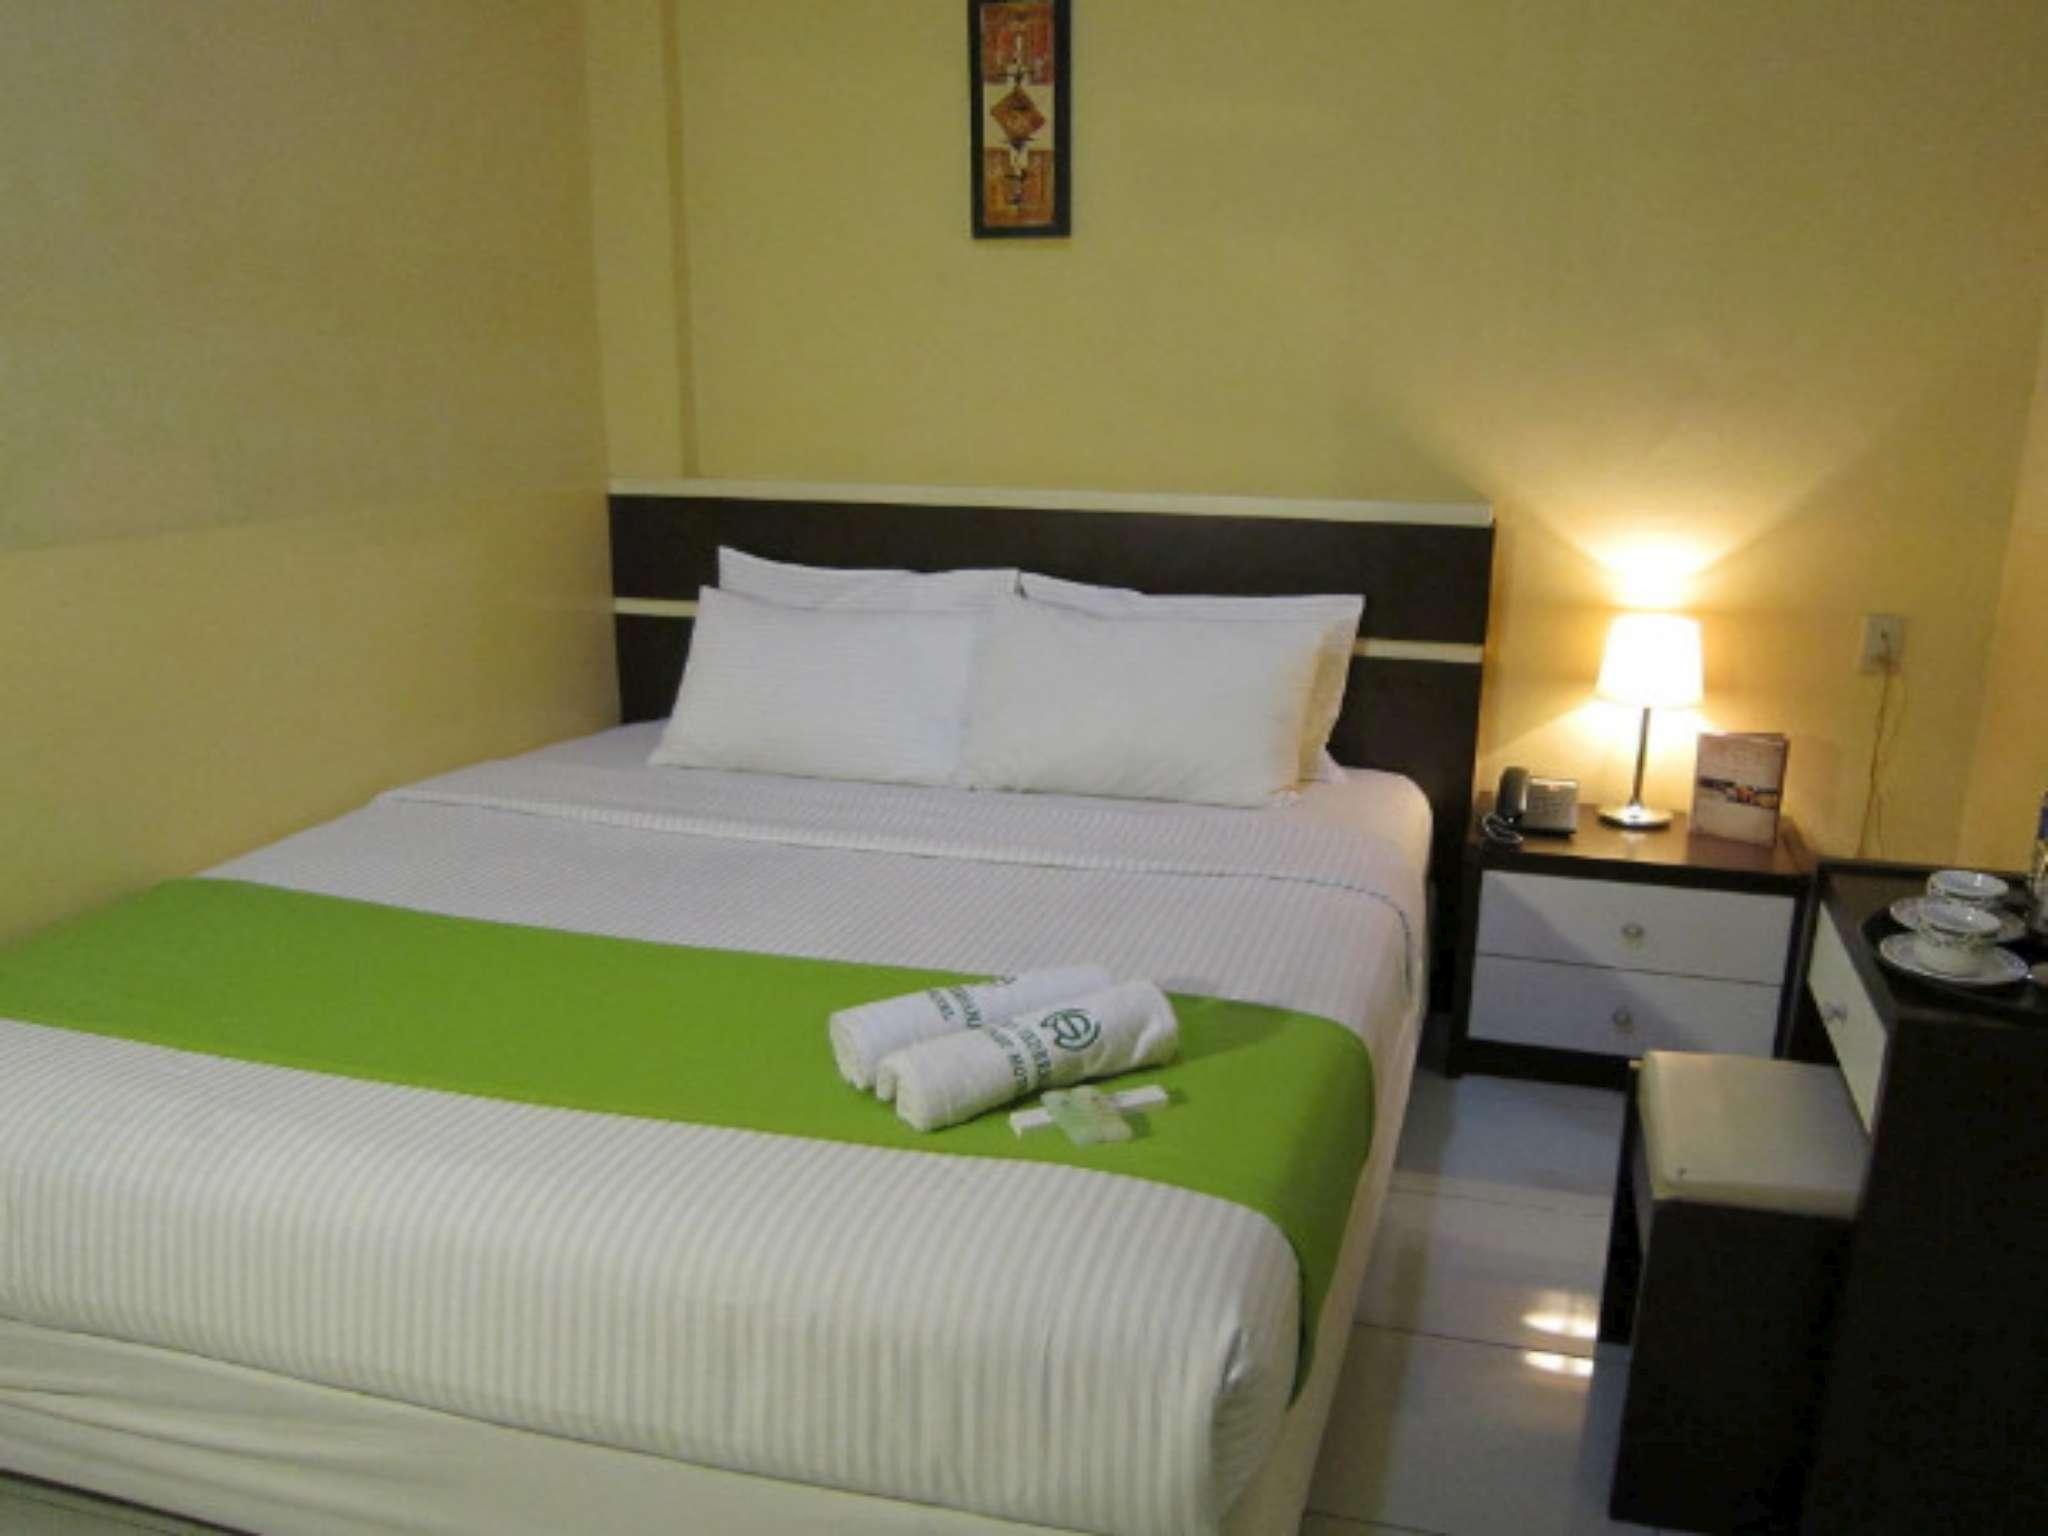 Wisma Sederhana Budget Hotel Medan  PROMO TERBARU 5 Rp 5